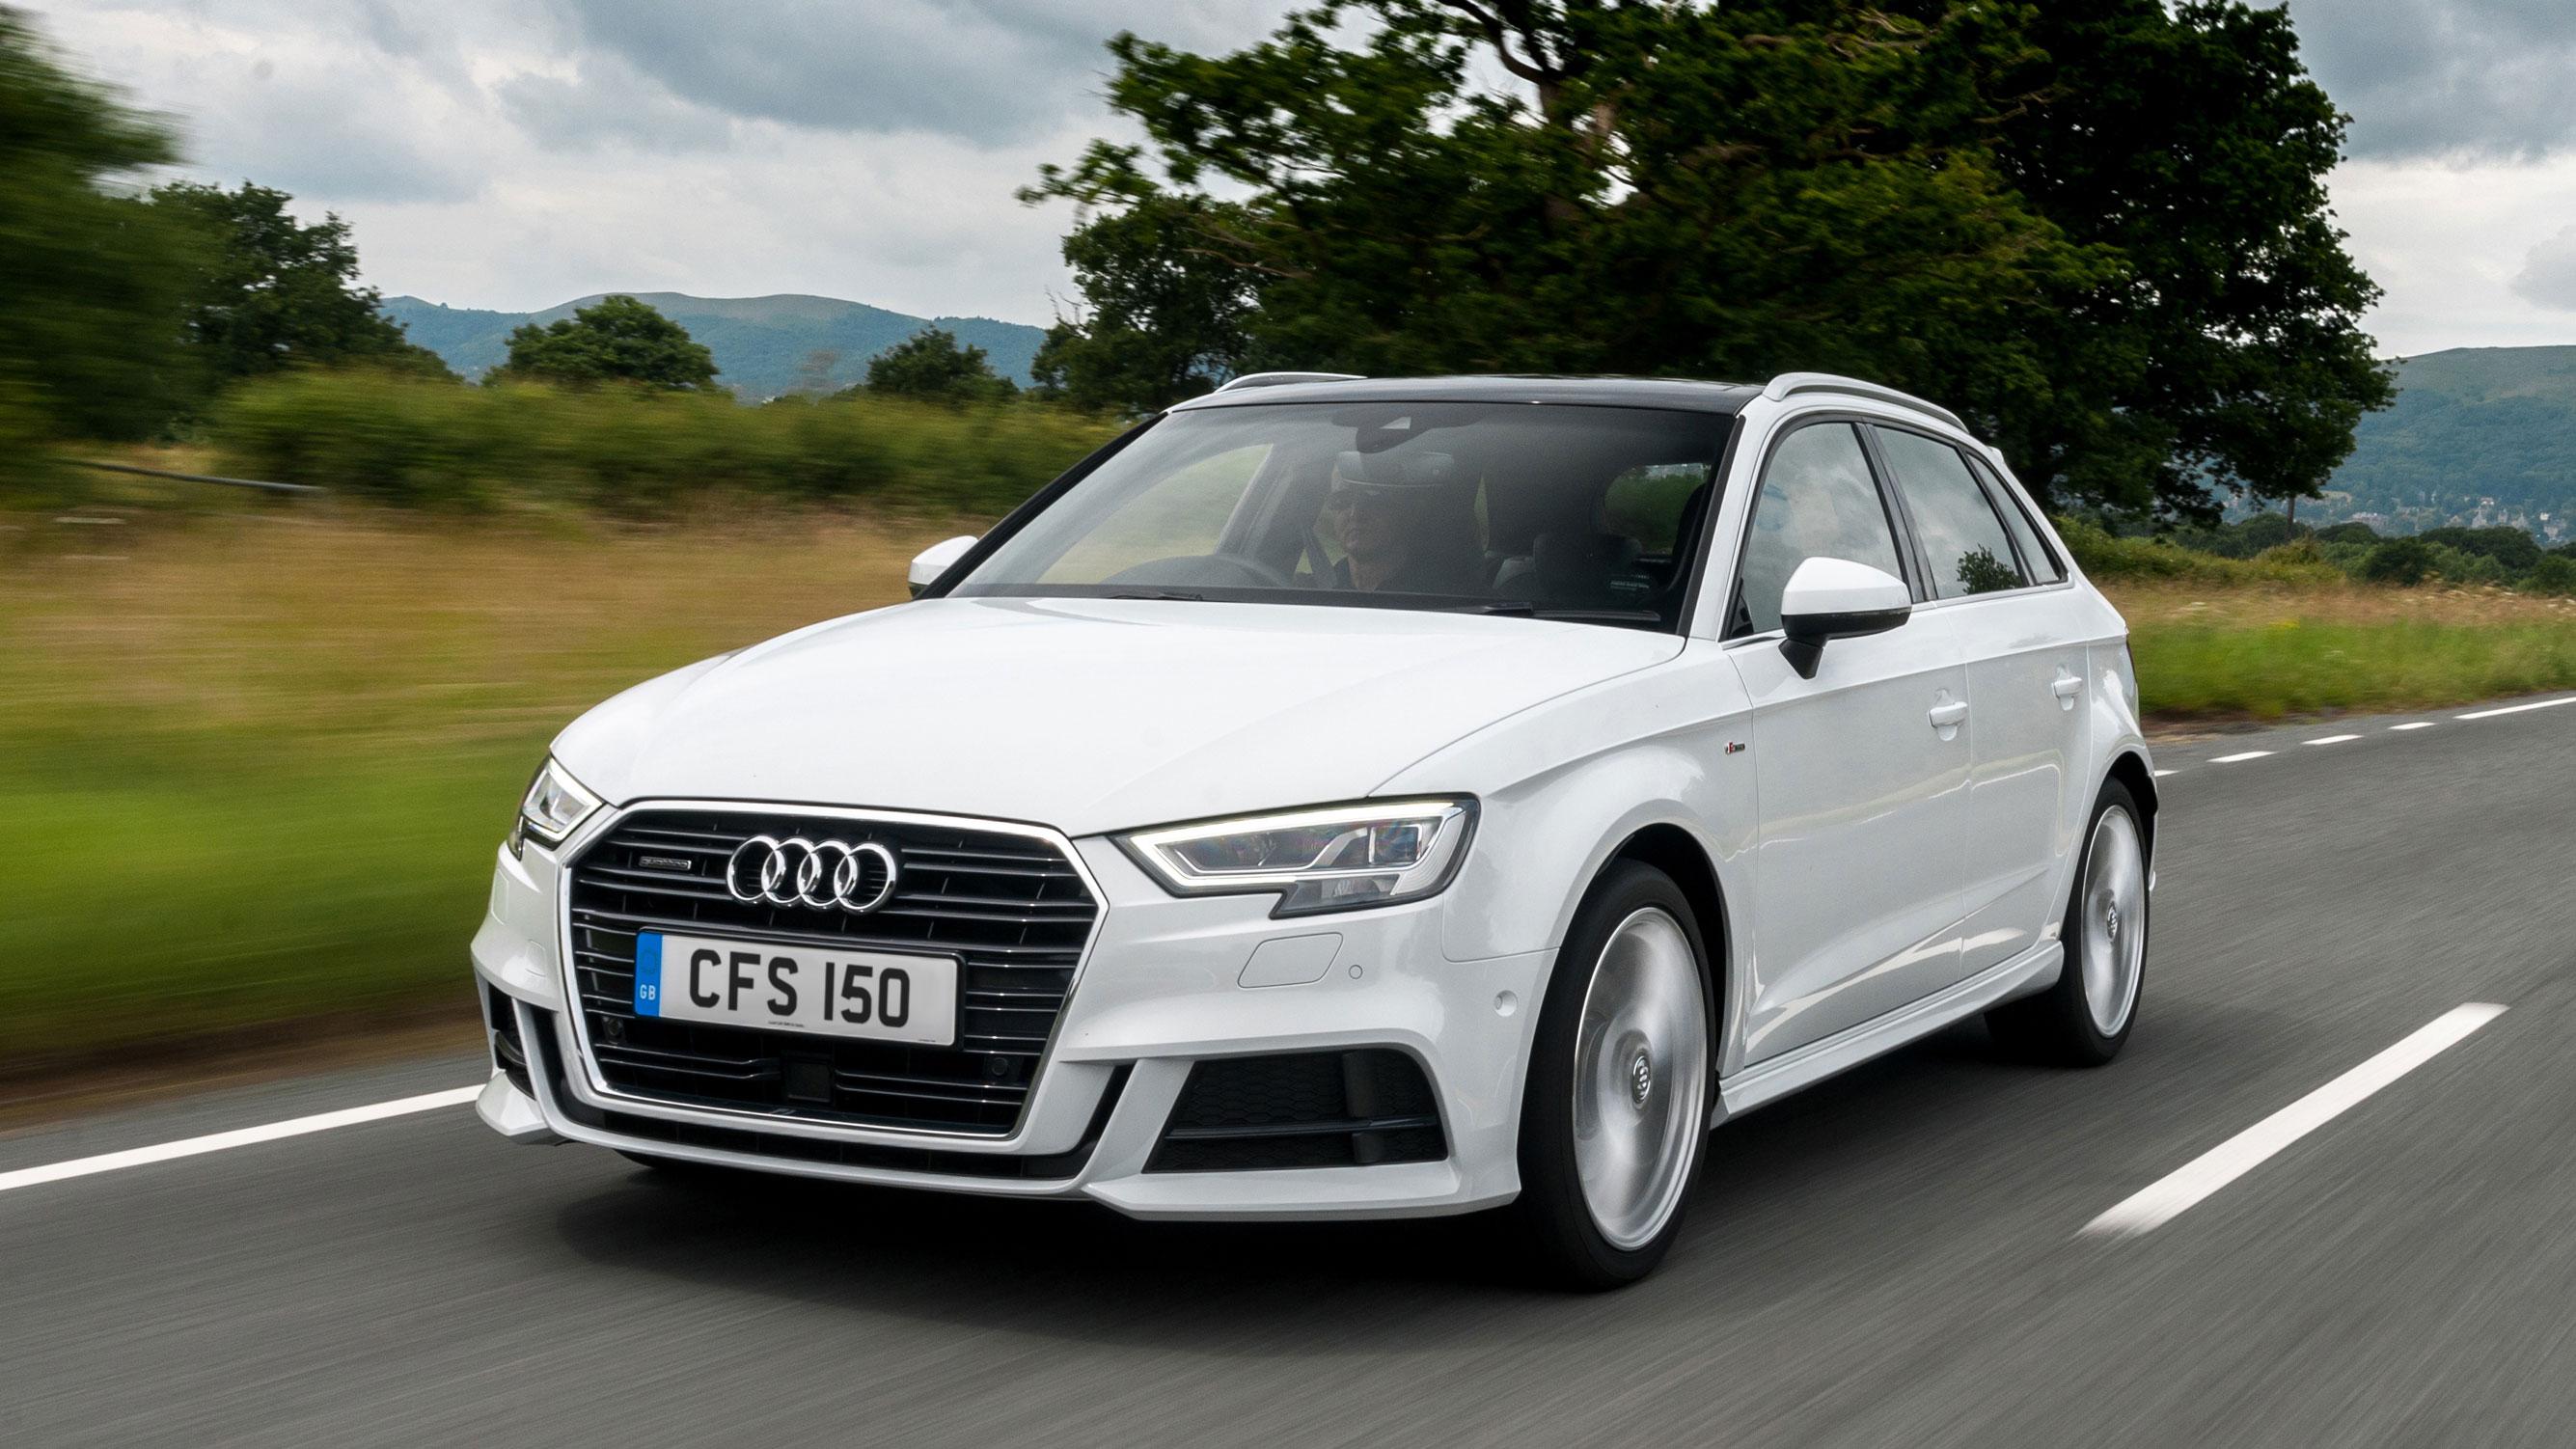 Satılık 2016 model Audi marka A3 tipli otomobil